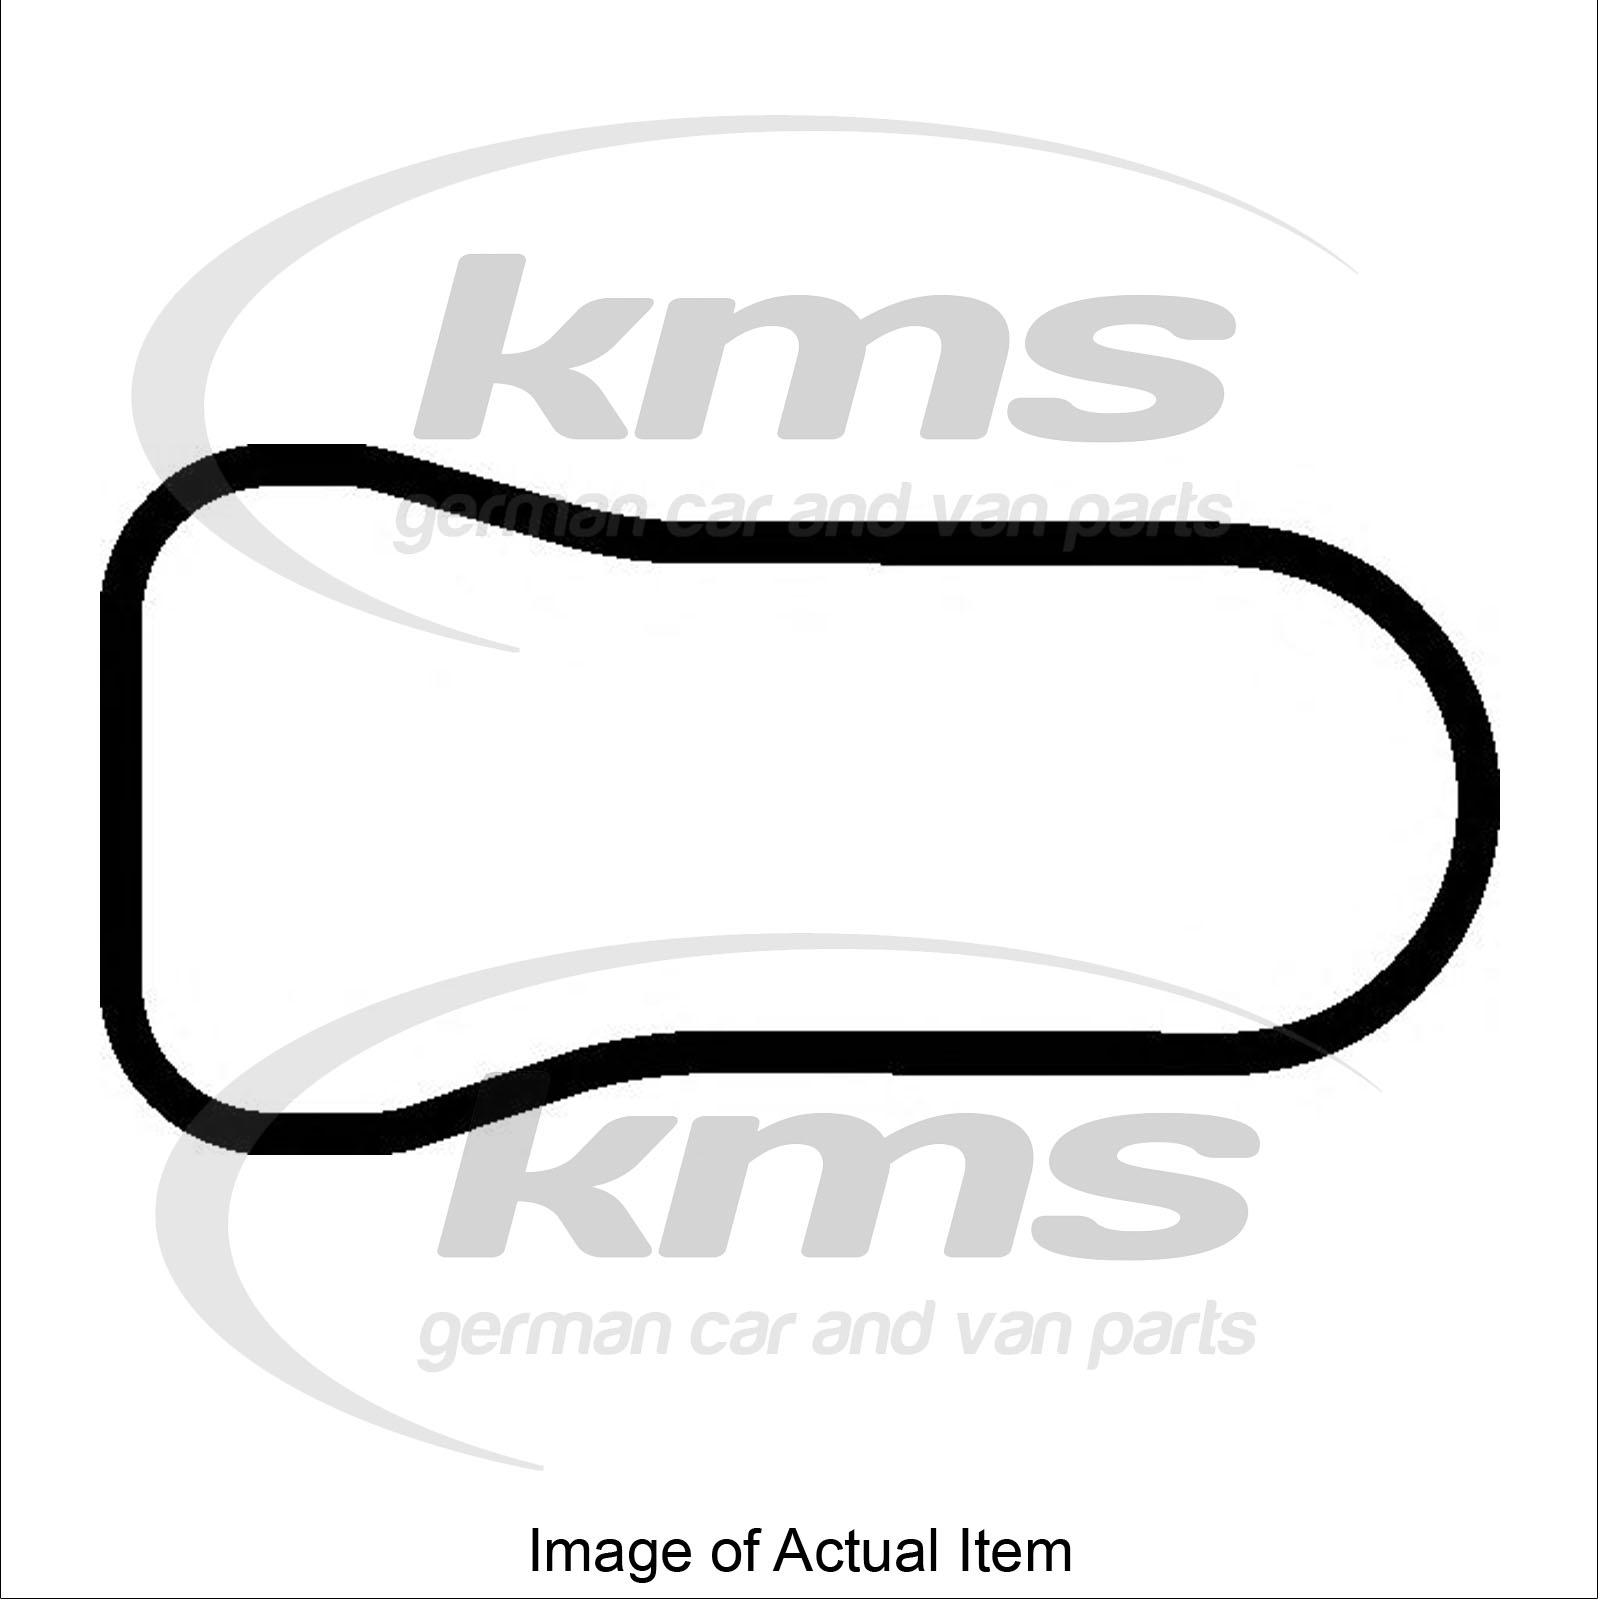 Intake Manifold Gasket Mercedes E Class W211 E 220 Cdi